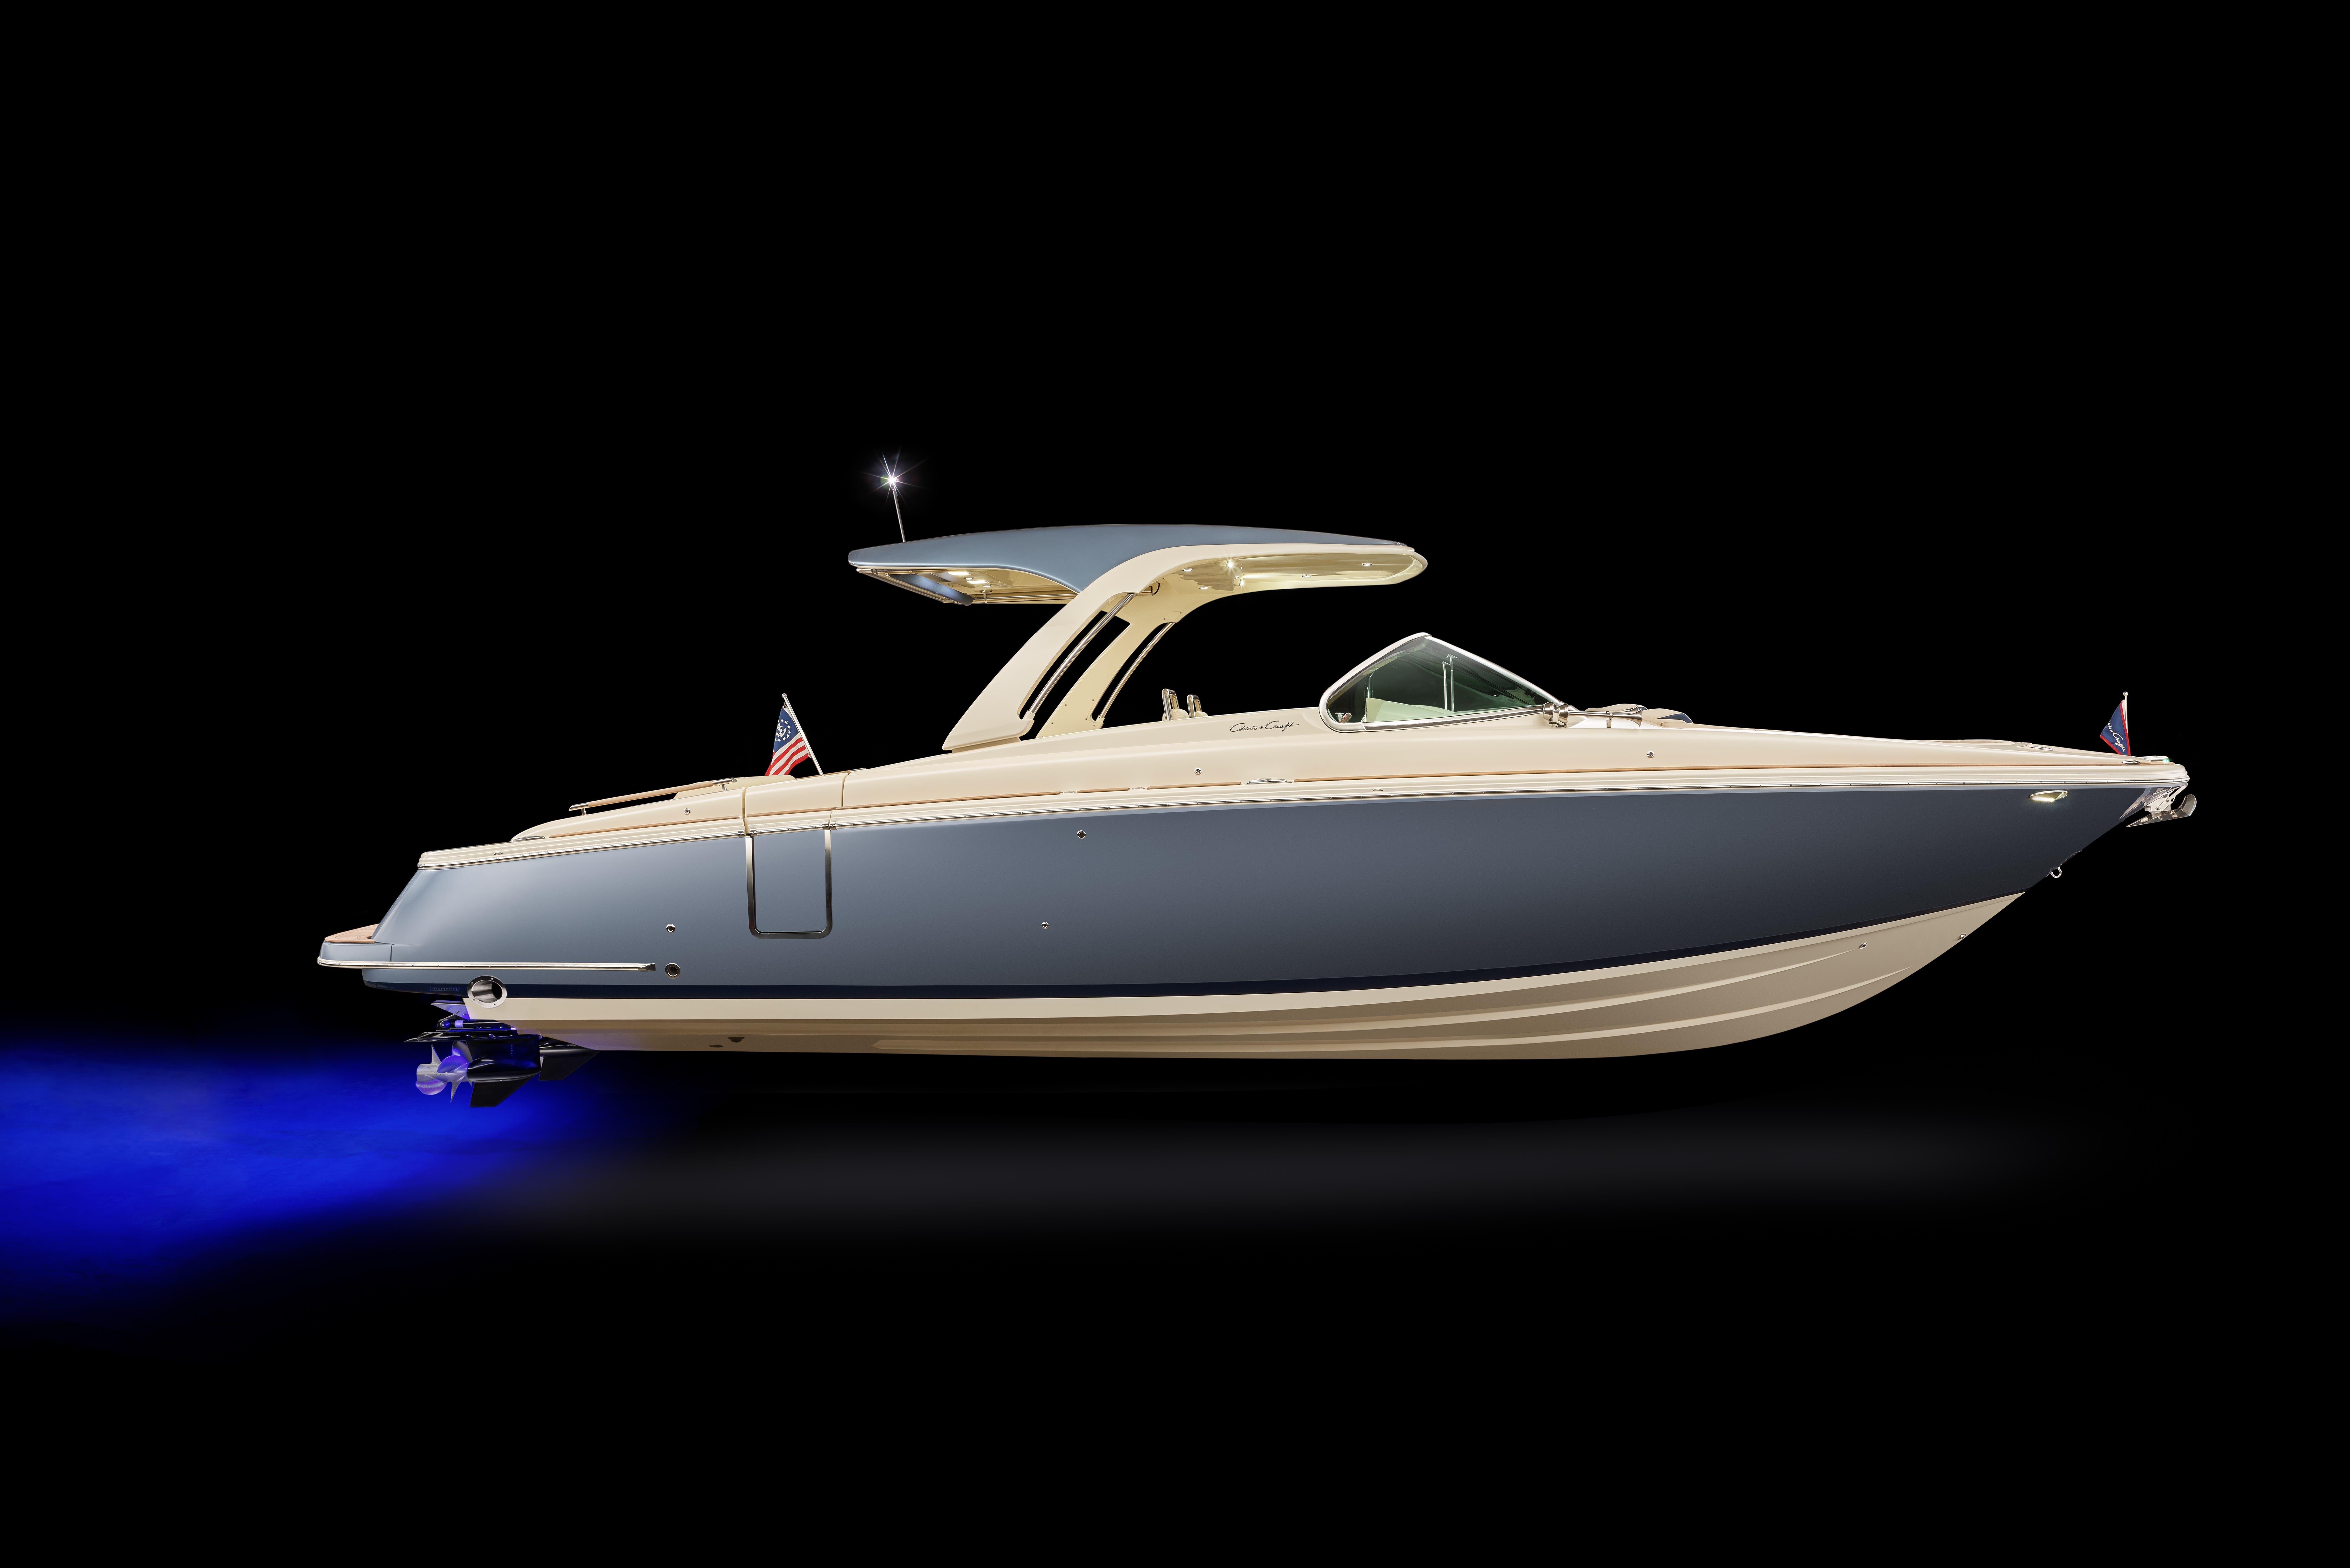 2021 CHRIS - CRAFT 35 GT LAUNCH